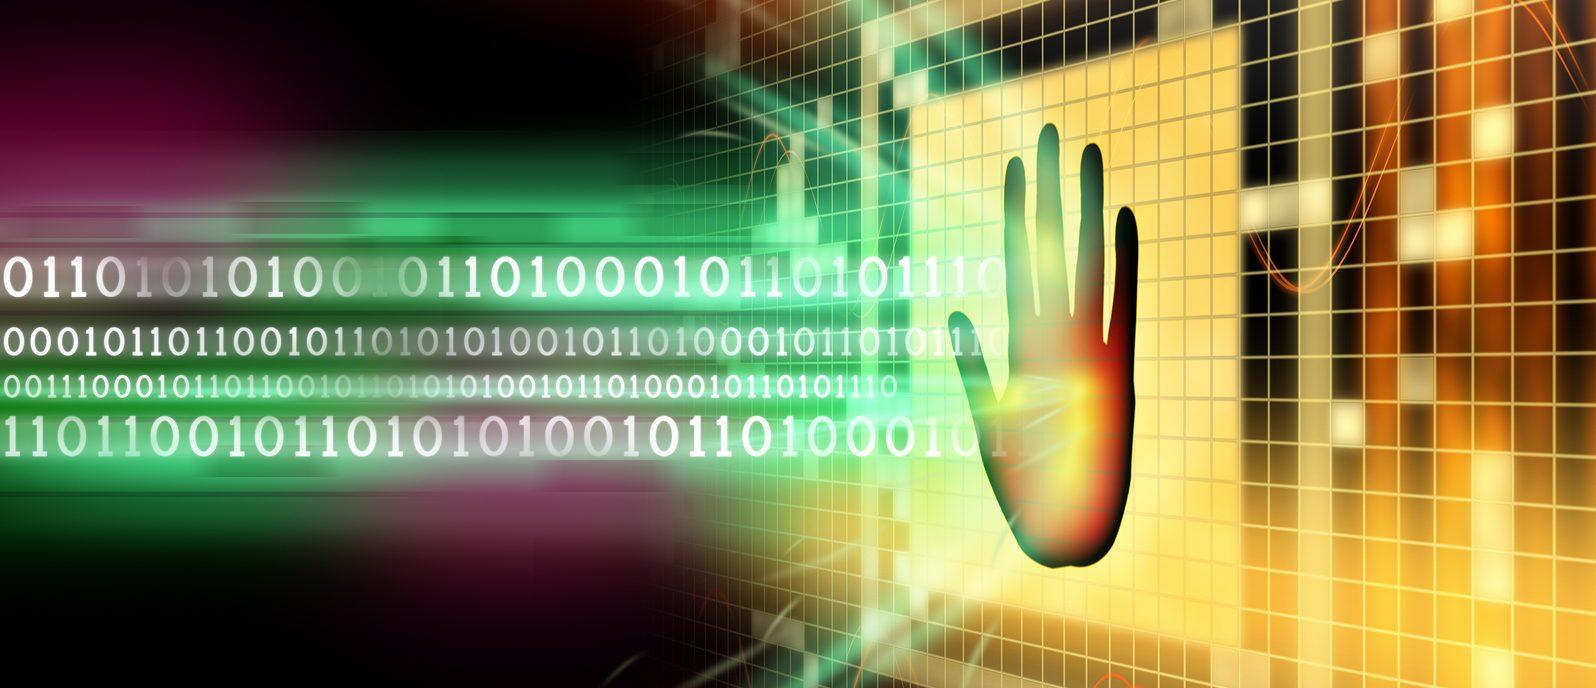 Software protection blocking a binary code stream. Digital illustration.